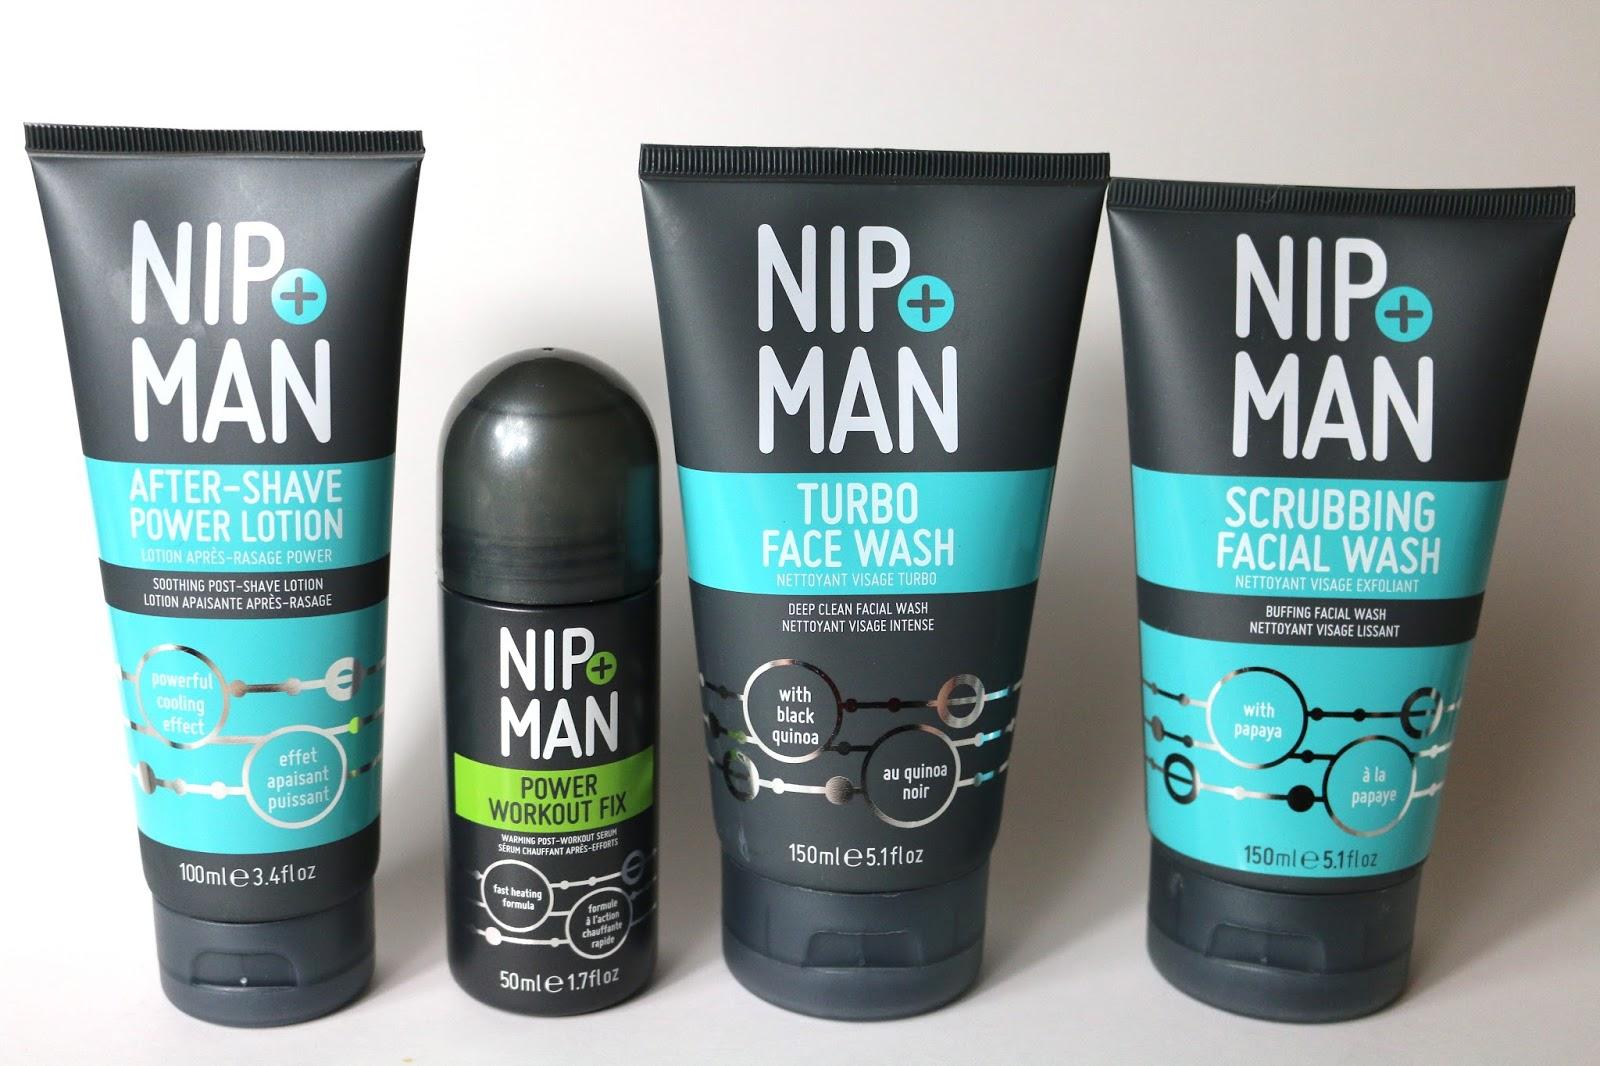 nip + man products